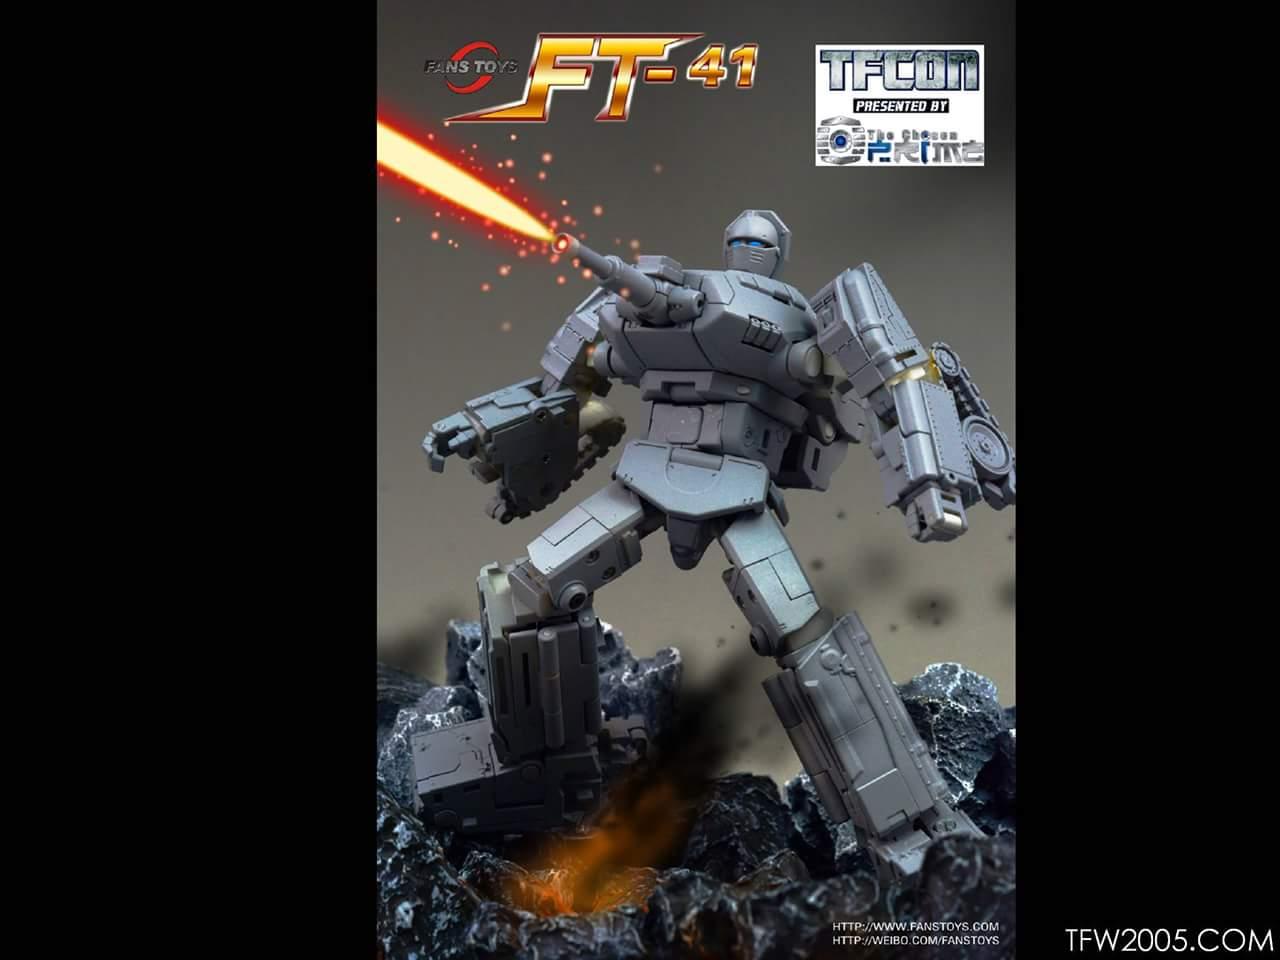 [Fanstoys] Produit Tiers - Minibots MP - Gamme FT HwJVU62m_o